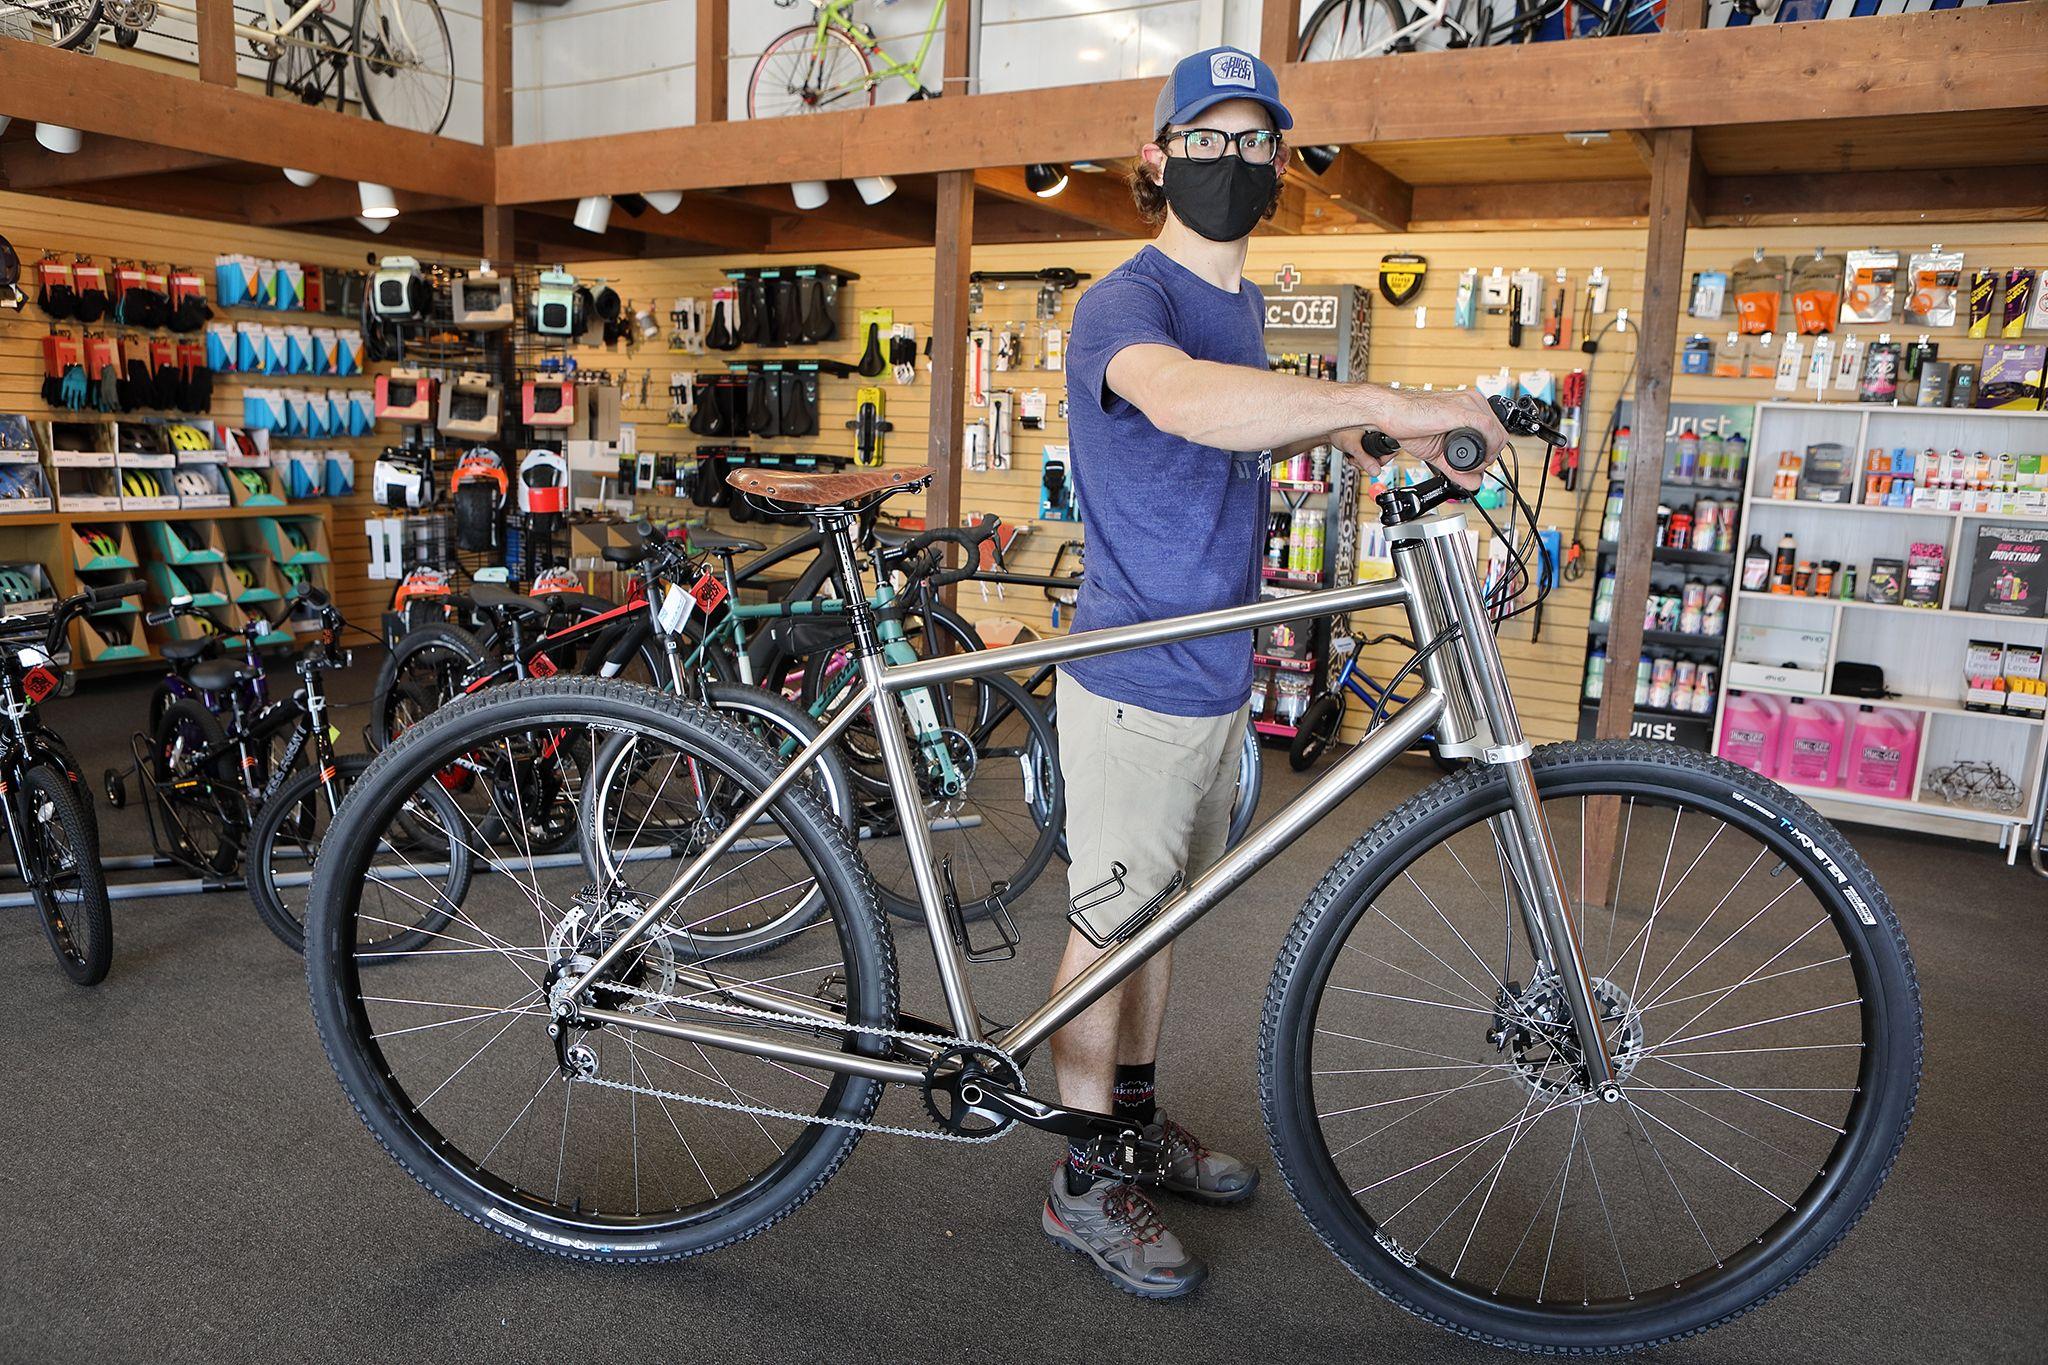 Thomson Bike - How Do You Build a Bike for Shaquille O'Neal?